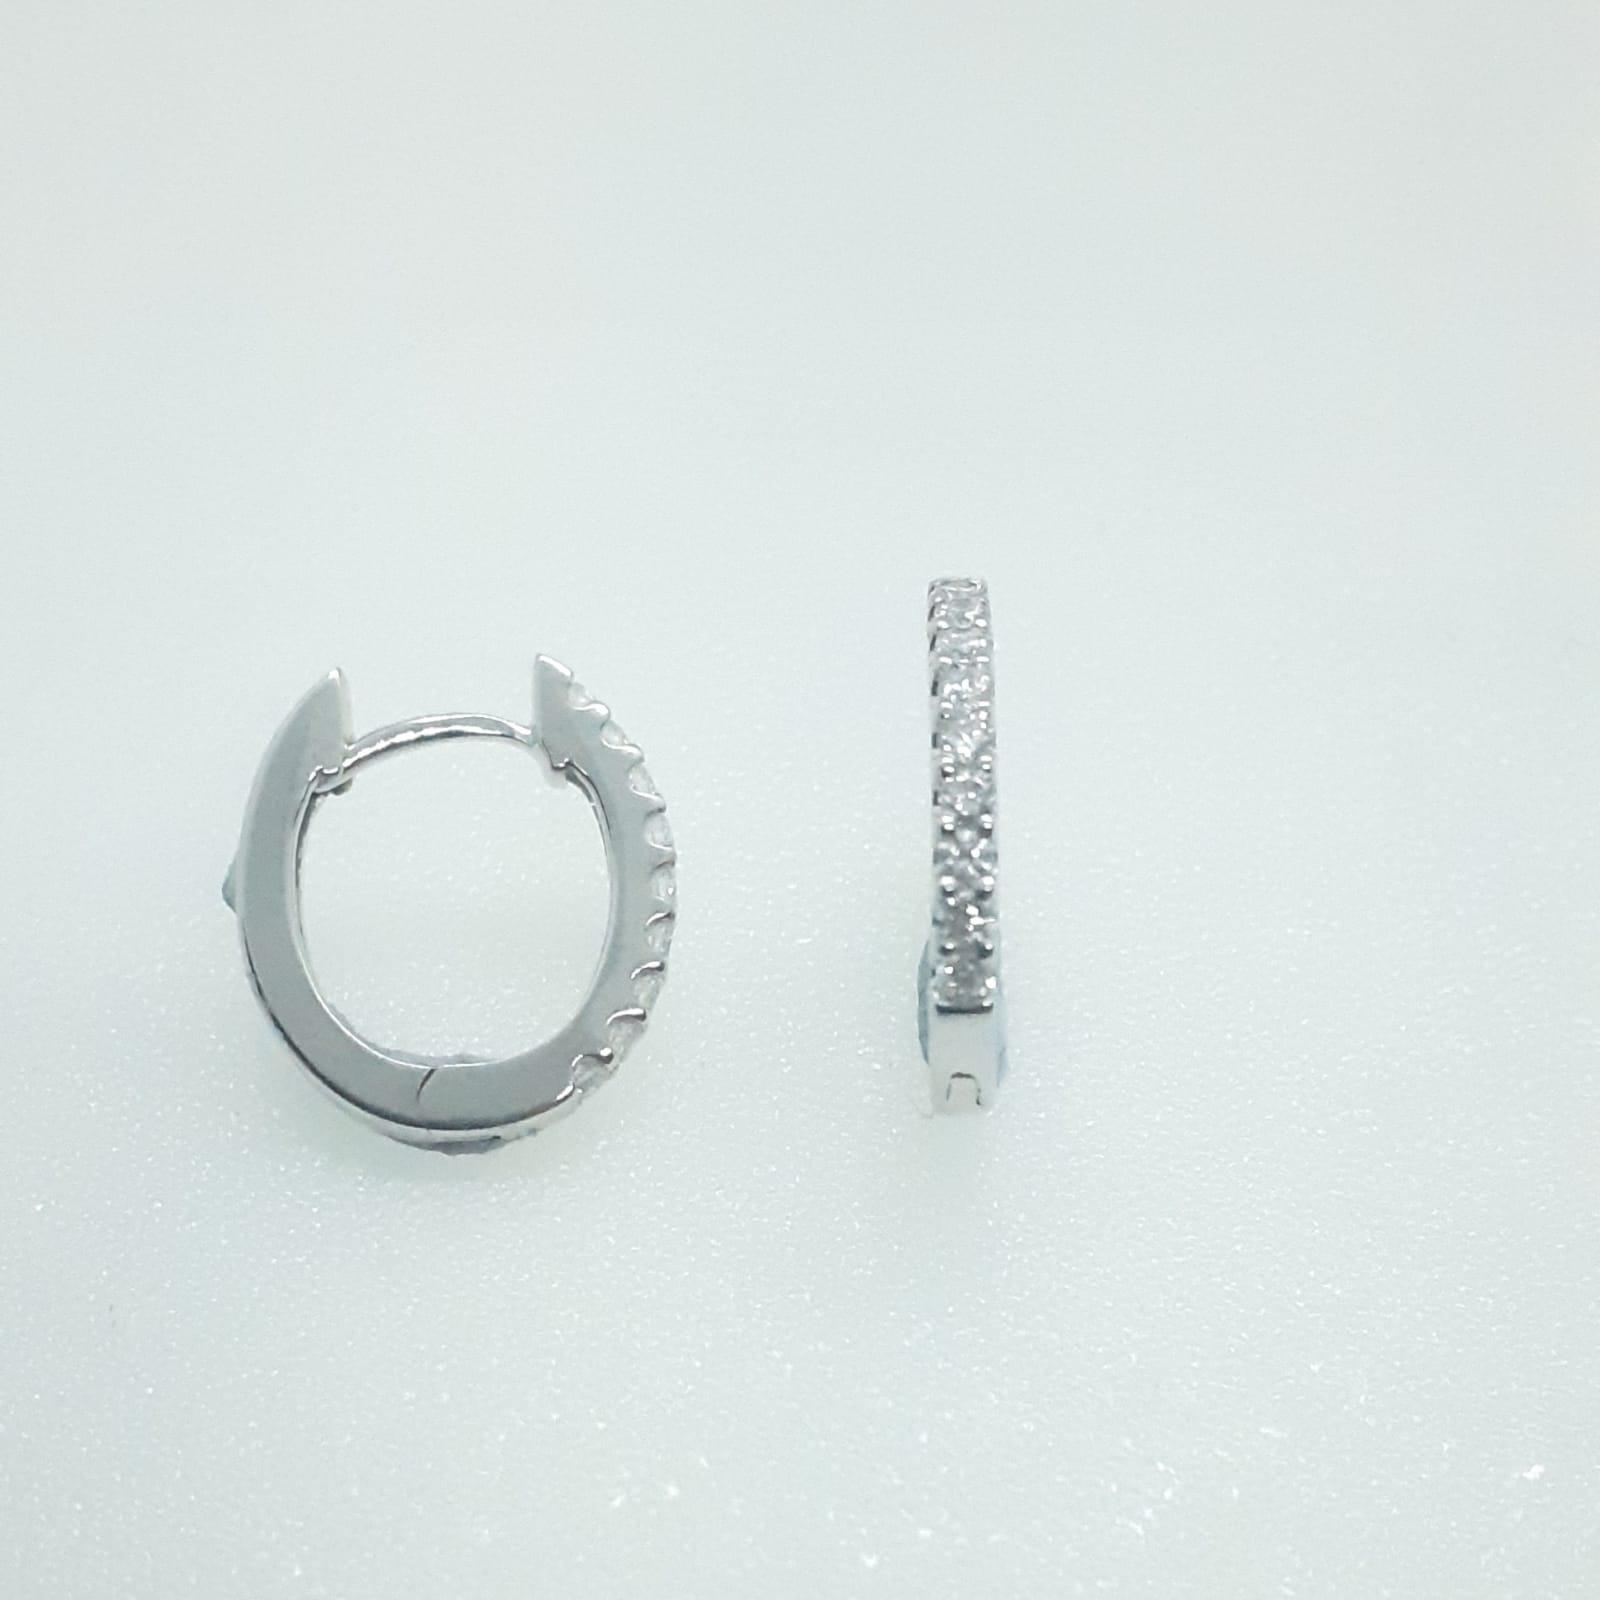 Sensi joyas jewellery Granada silver engagementDIAMONDS EARRINGS 8,4mm